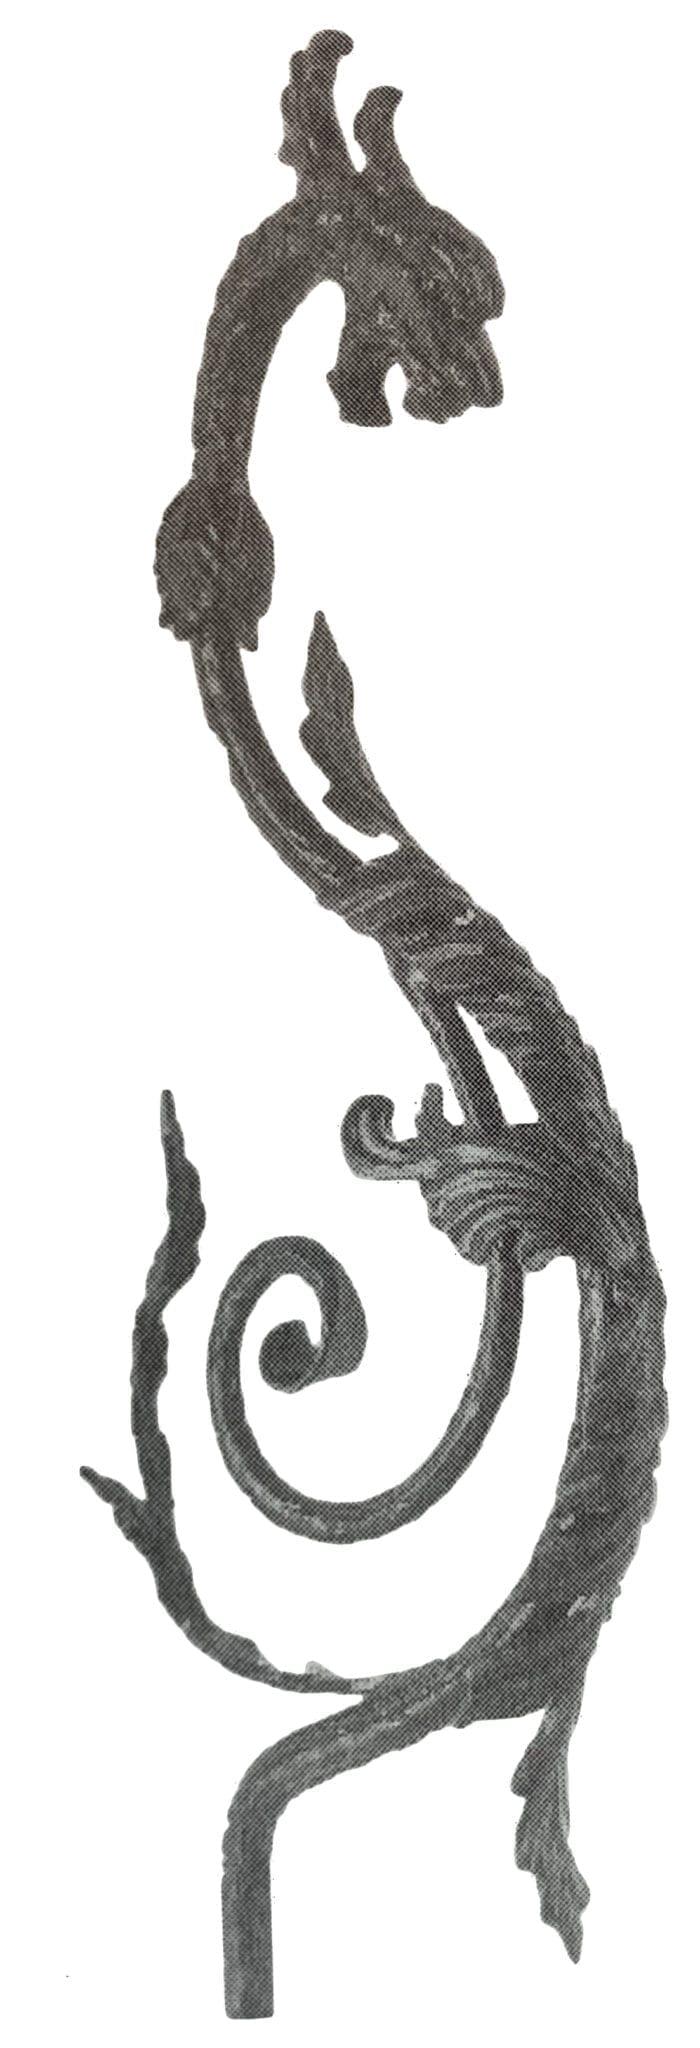 Ornamental steel forged dragon handrail starter